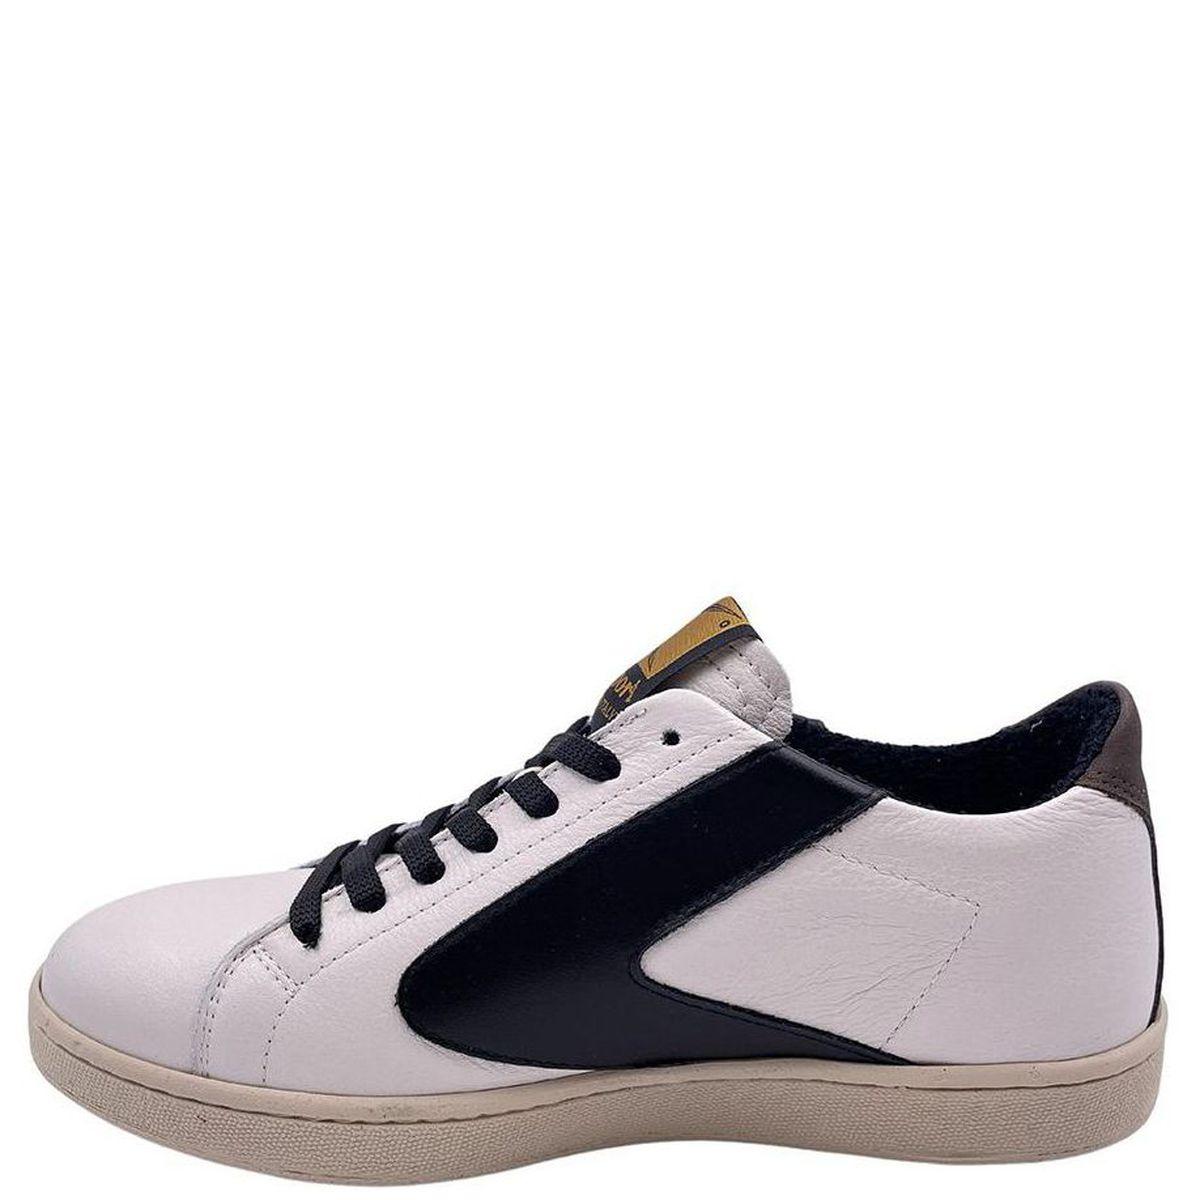 1. Sneakers Tournament XL Bicolore Valsport